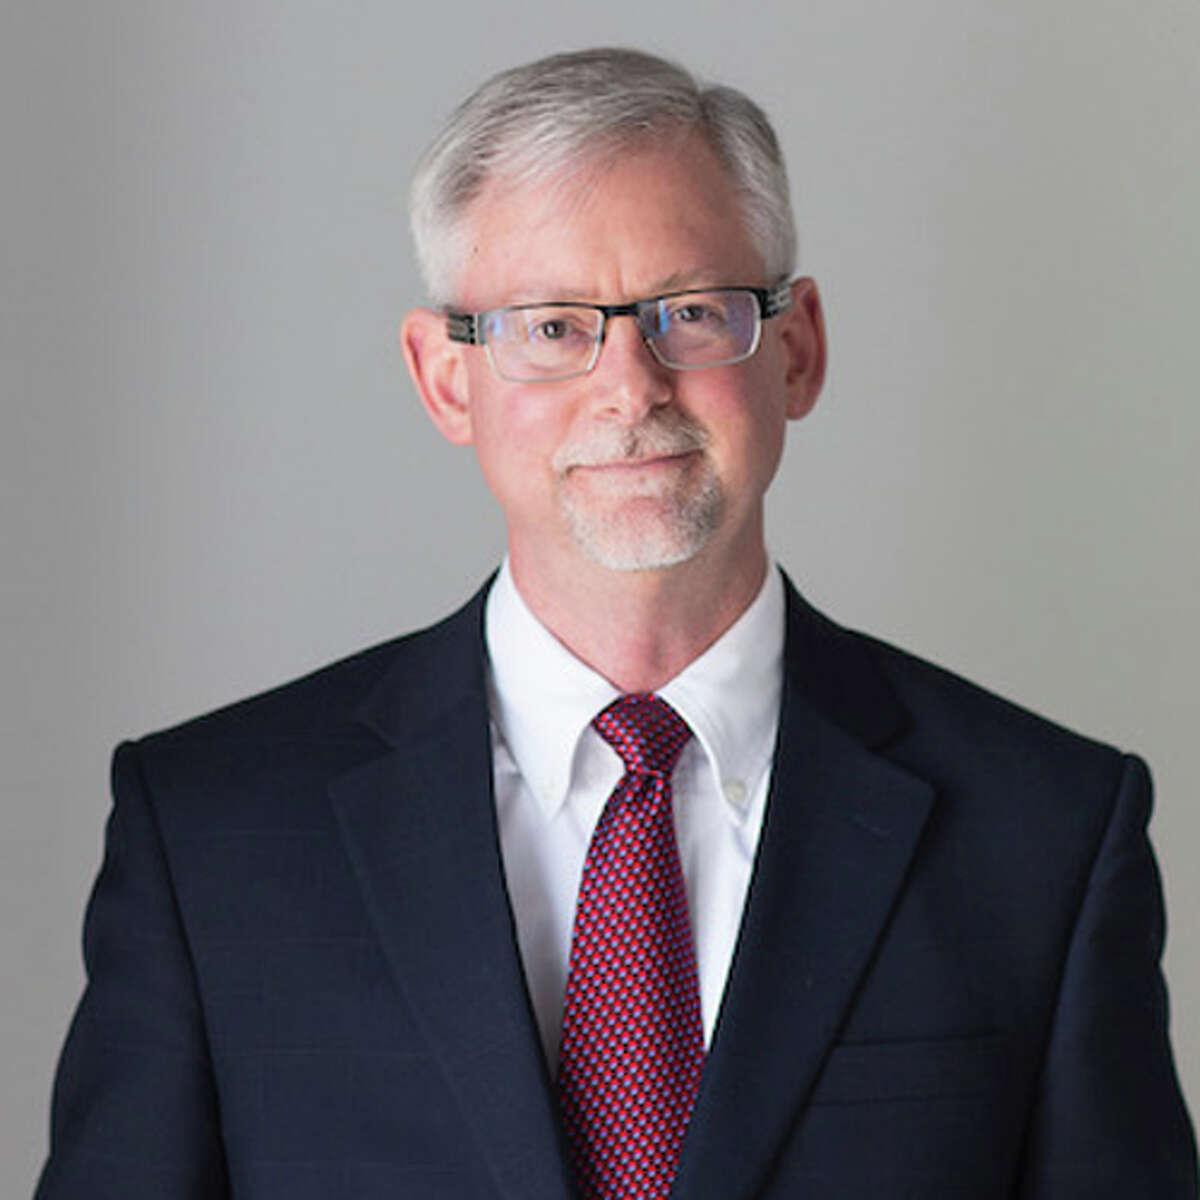 Don Burdick, chief executive officer of Olifant Energy II.